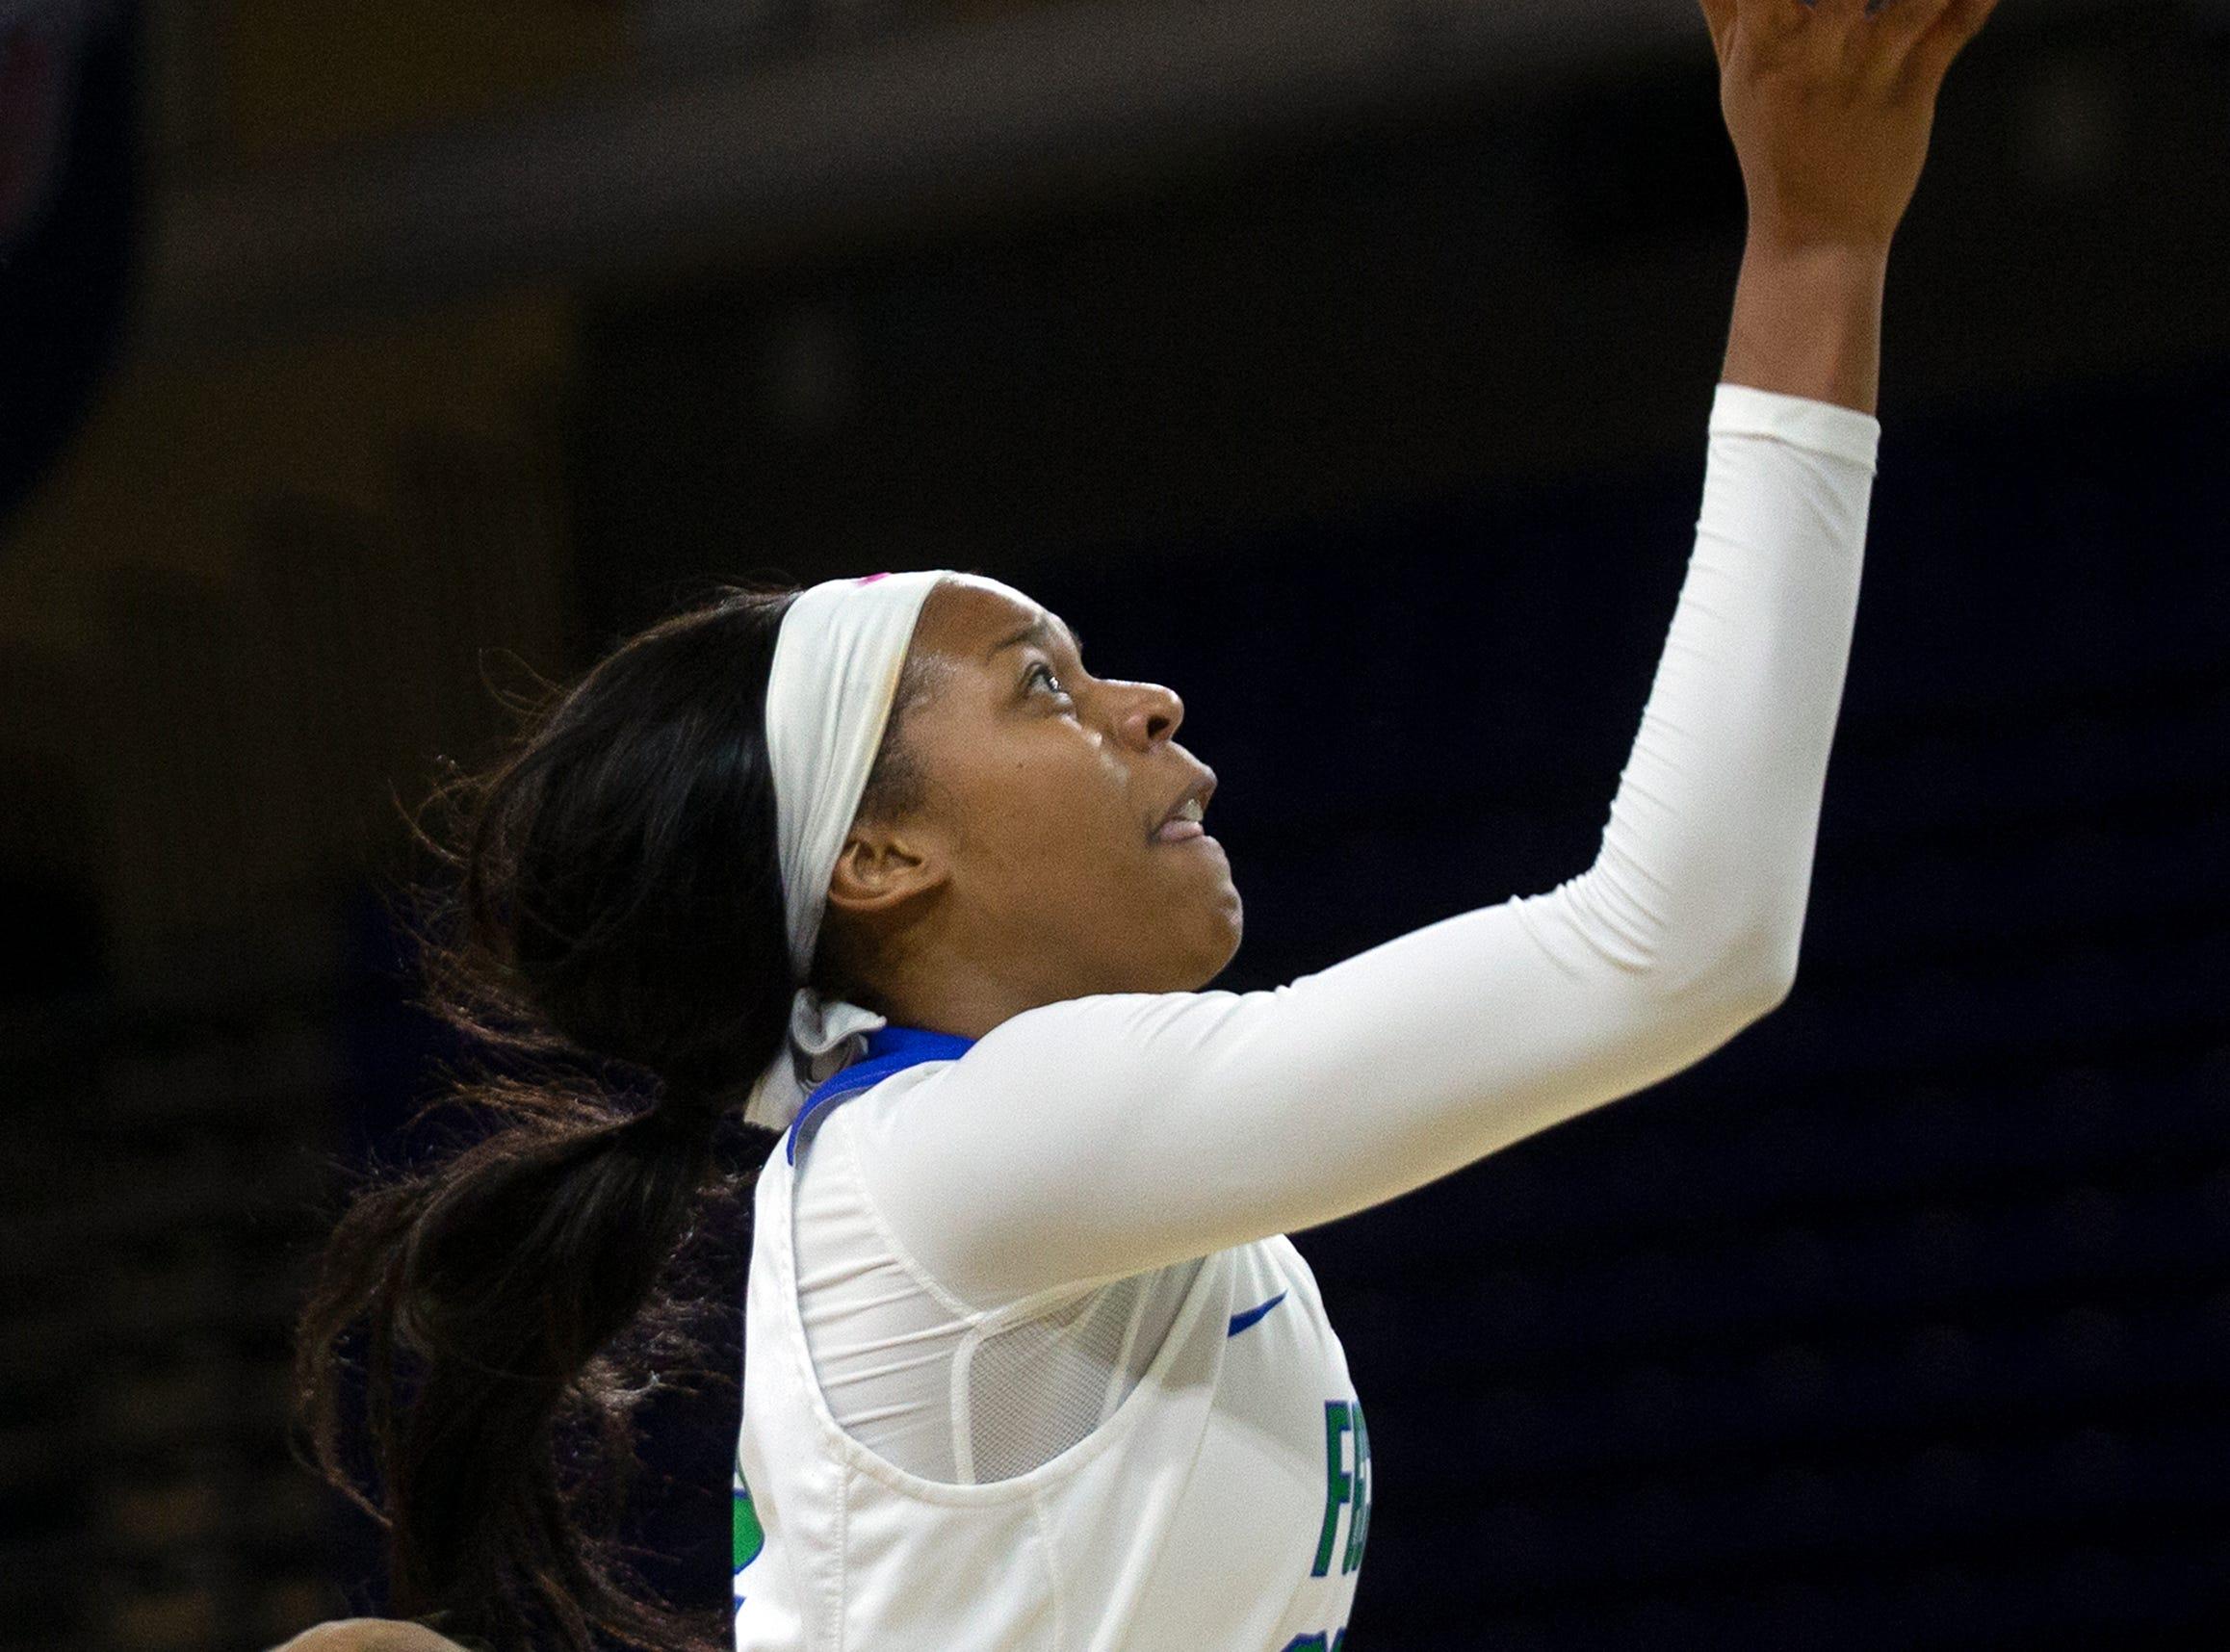 Florida Gulf Coast University's Destiny Washington goes for a layup against Kennesaw State, Wednesday, March 13, 2019, at Florida Gulf Coast University's Alico Arena.